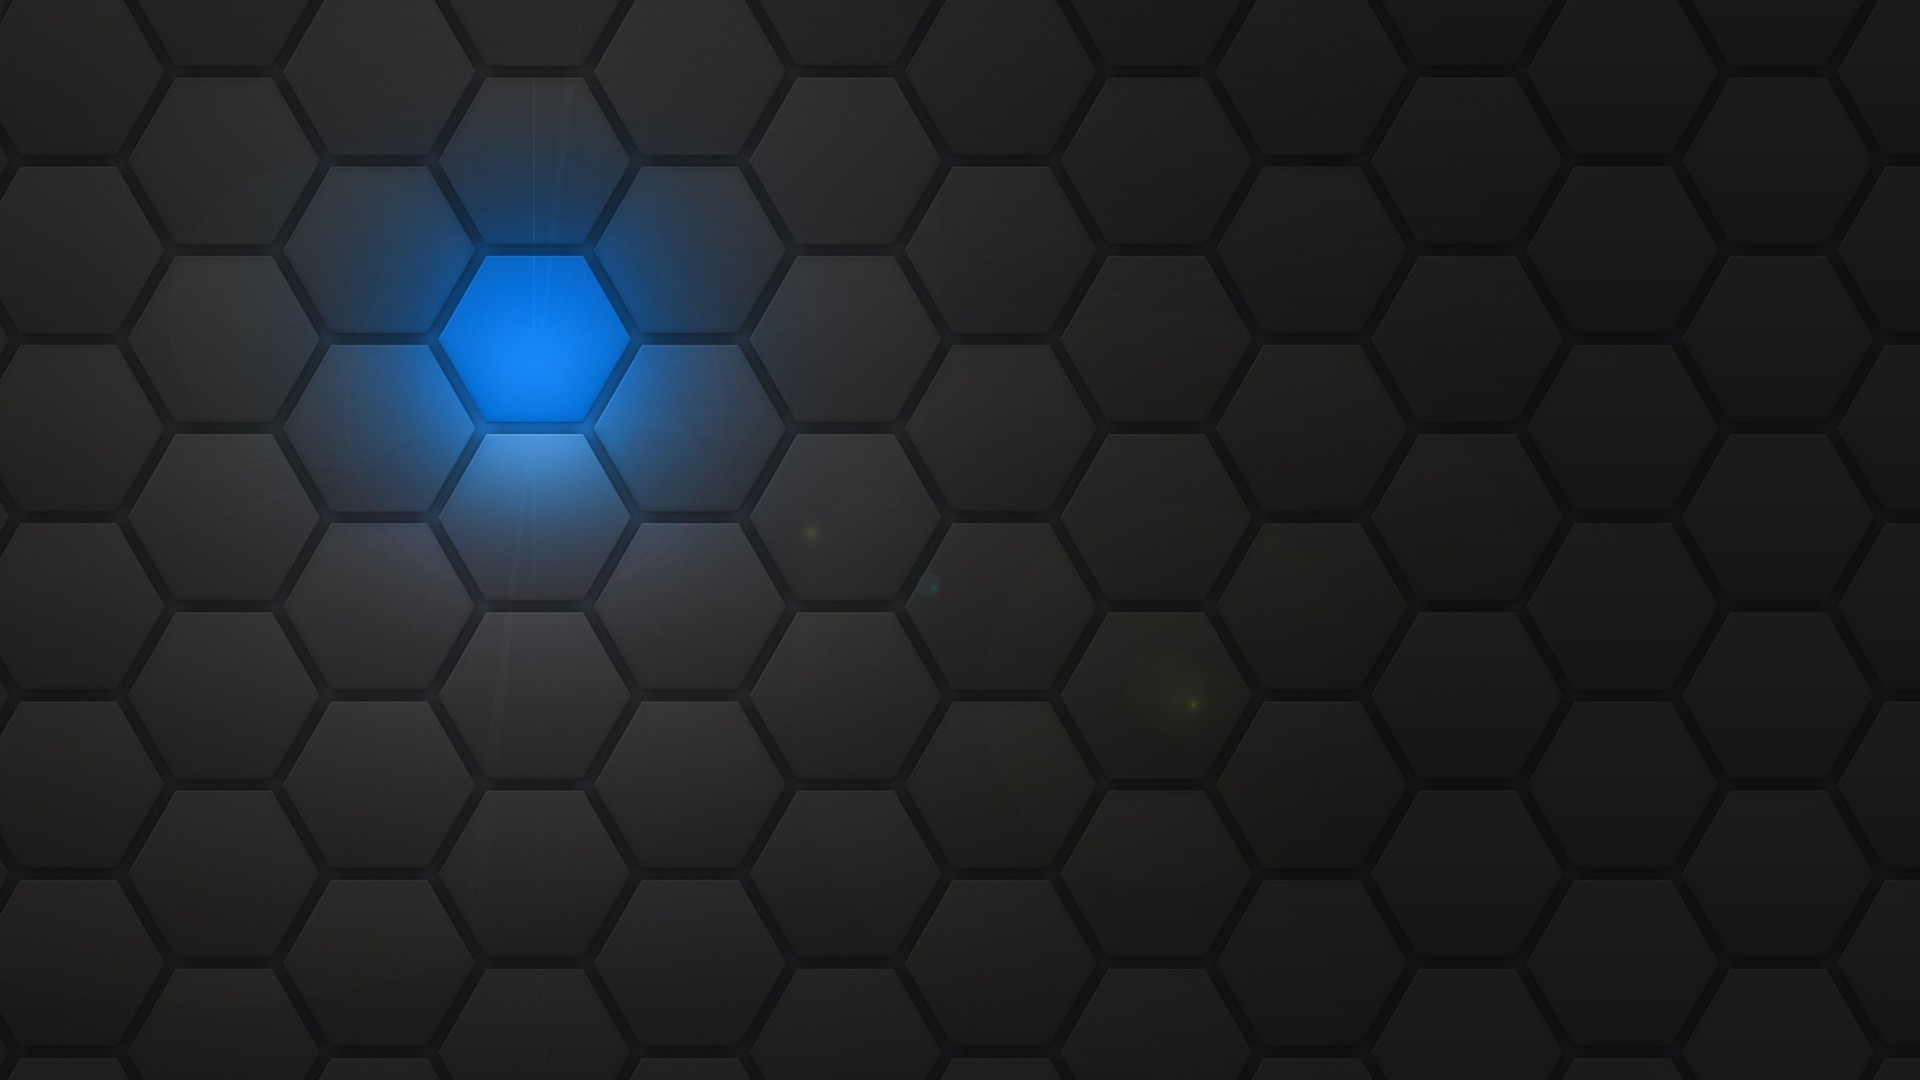 Res: 1920x1080, Hexagon Wallpaper Abstract 3D Wallpapers